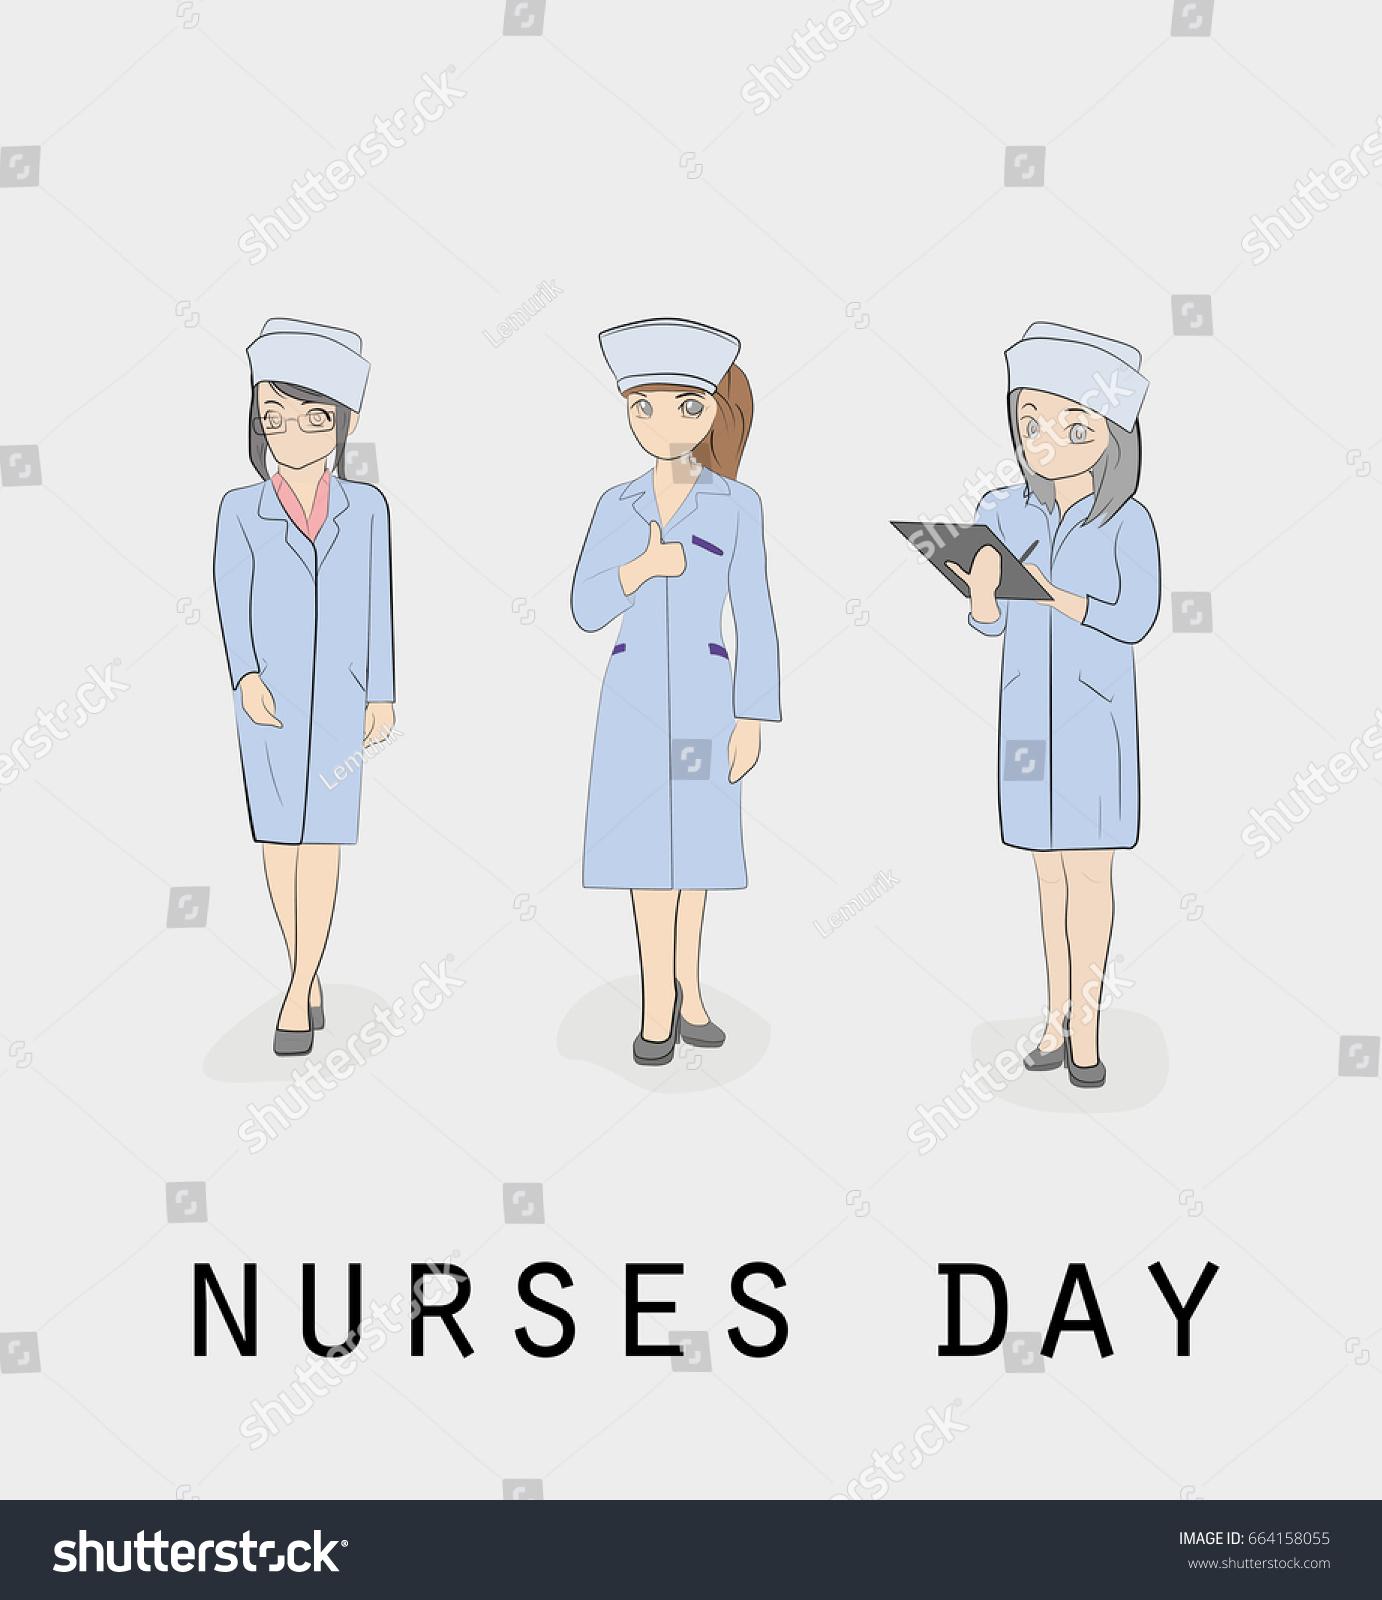 Nurses Nursing Day Hand Drawn Cartoon Stock Photo (Photo, Vector ...